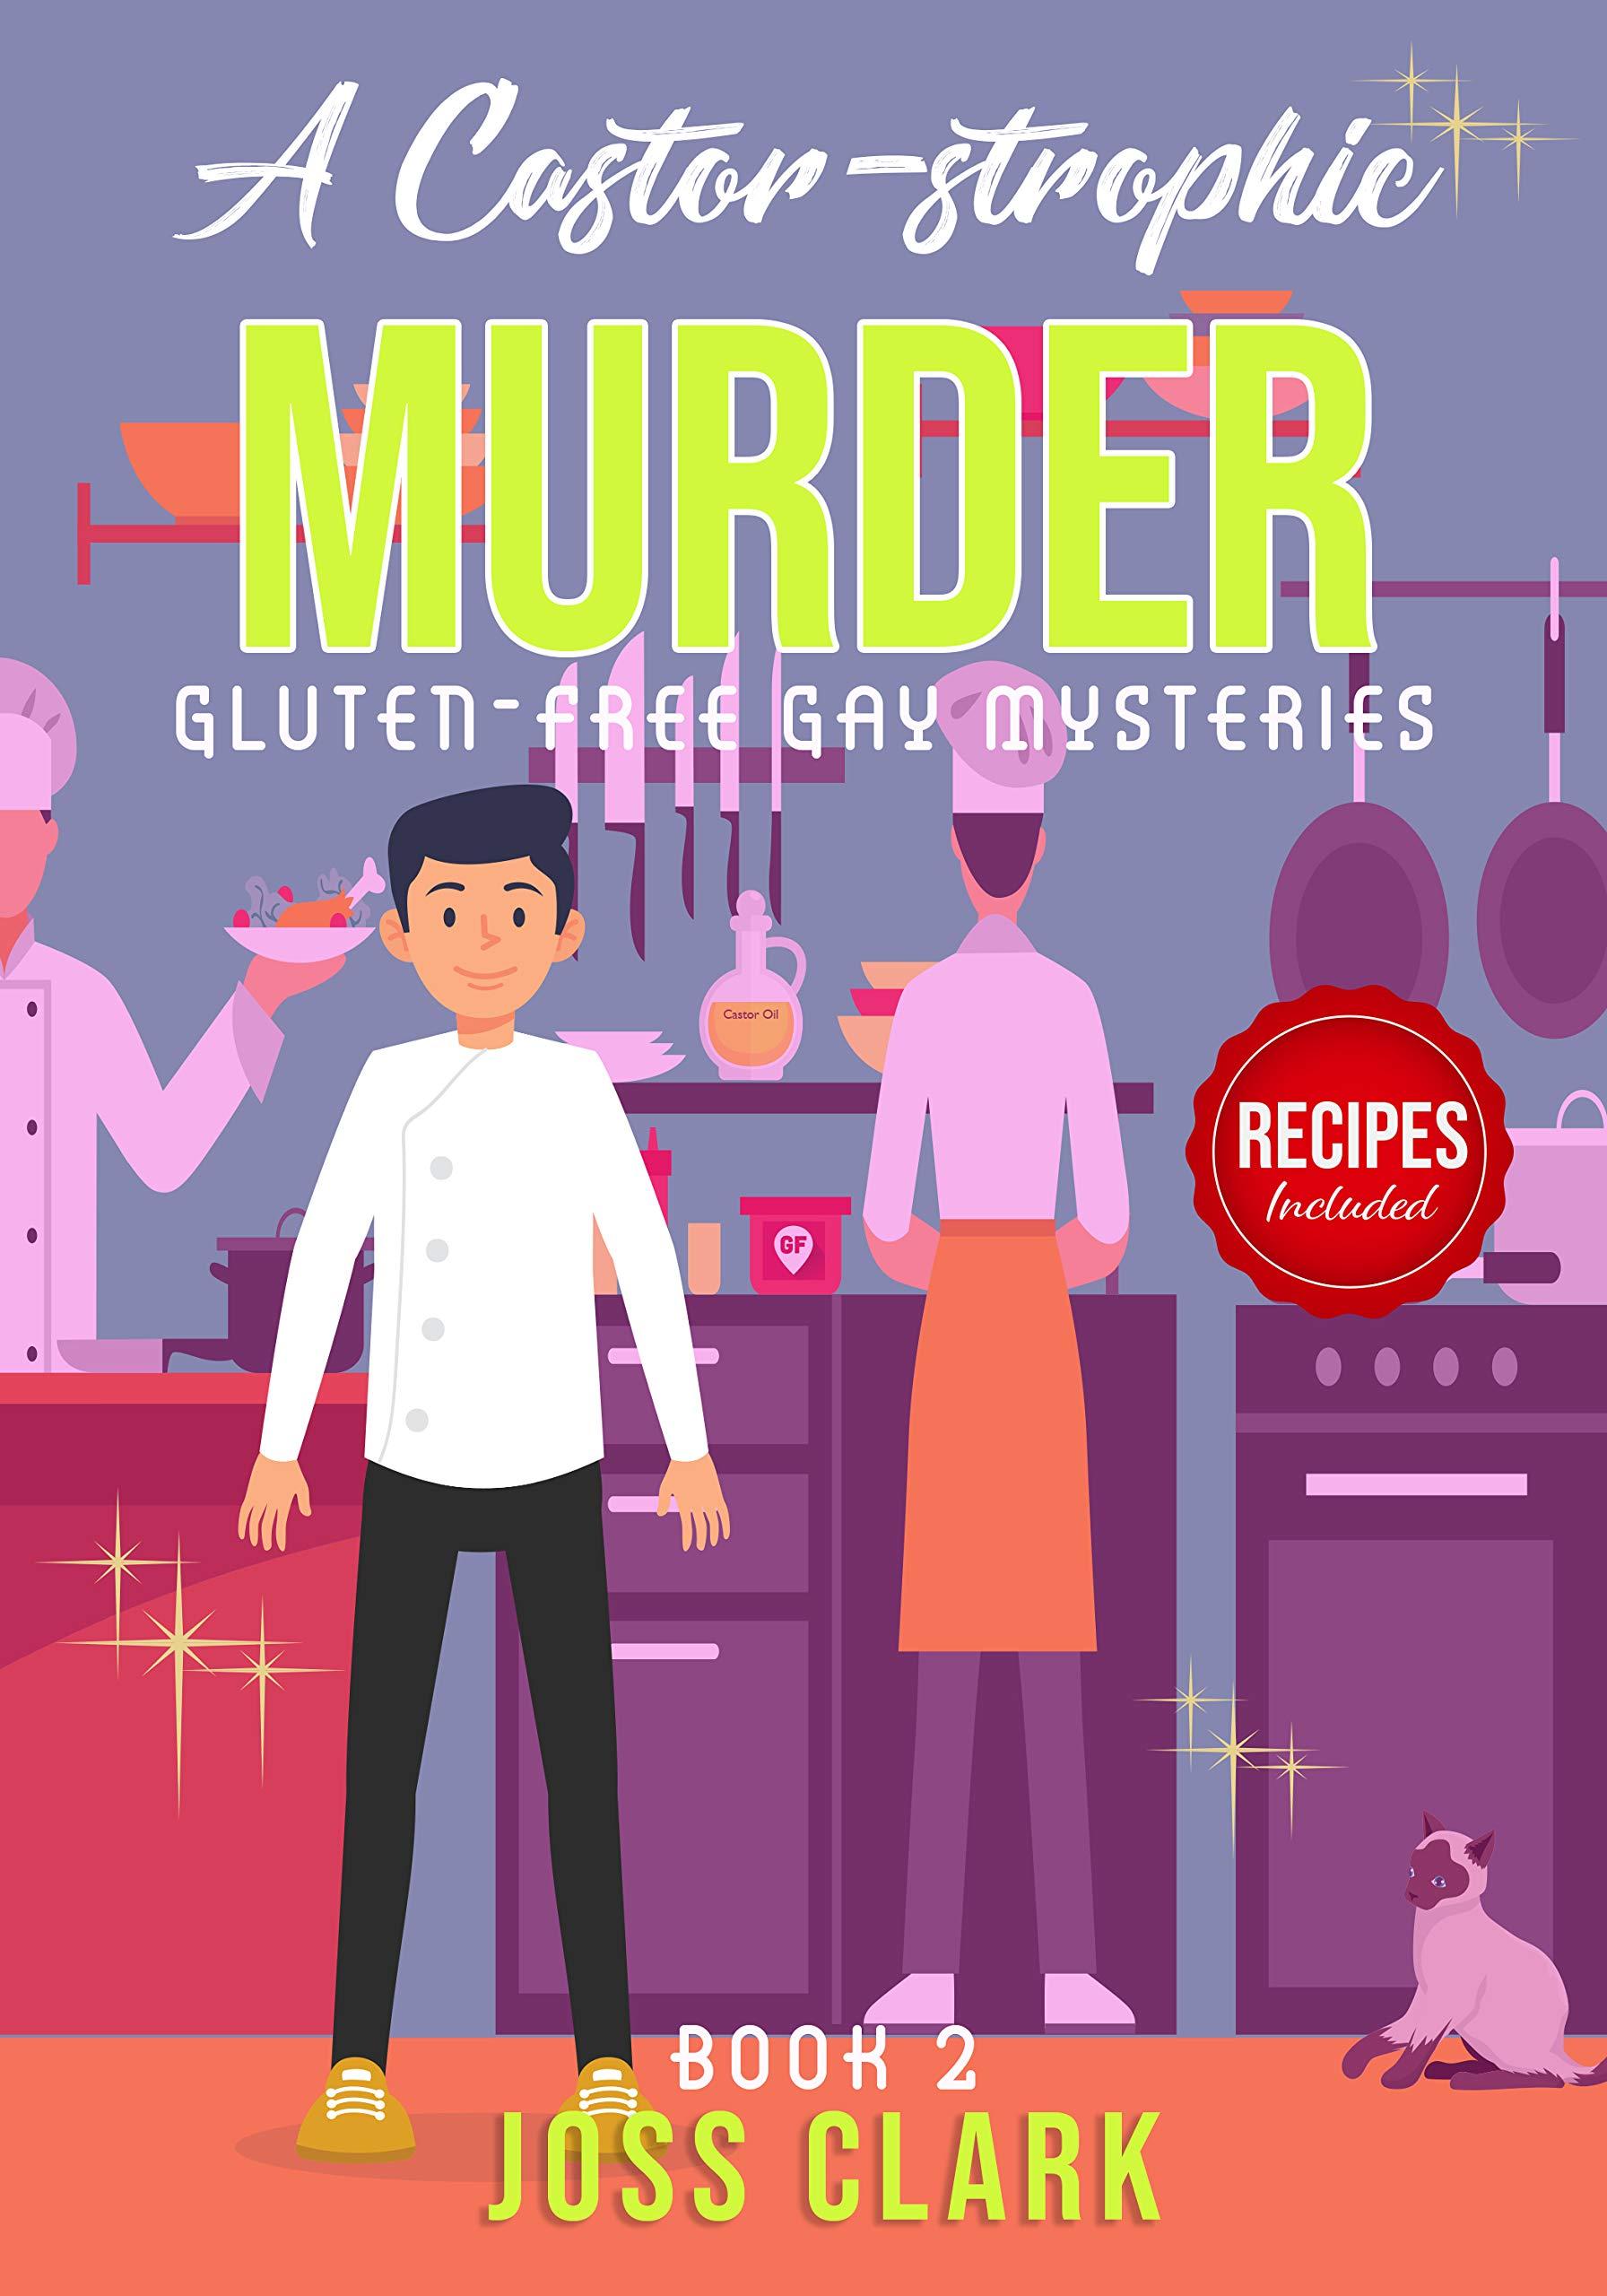 A Castor-strophic Murder: A One-Hour Mystery, Thriller & Suspense Short Read (Gluten-Free Gay Mystery Book 2)